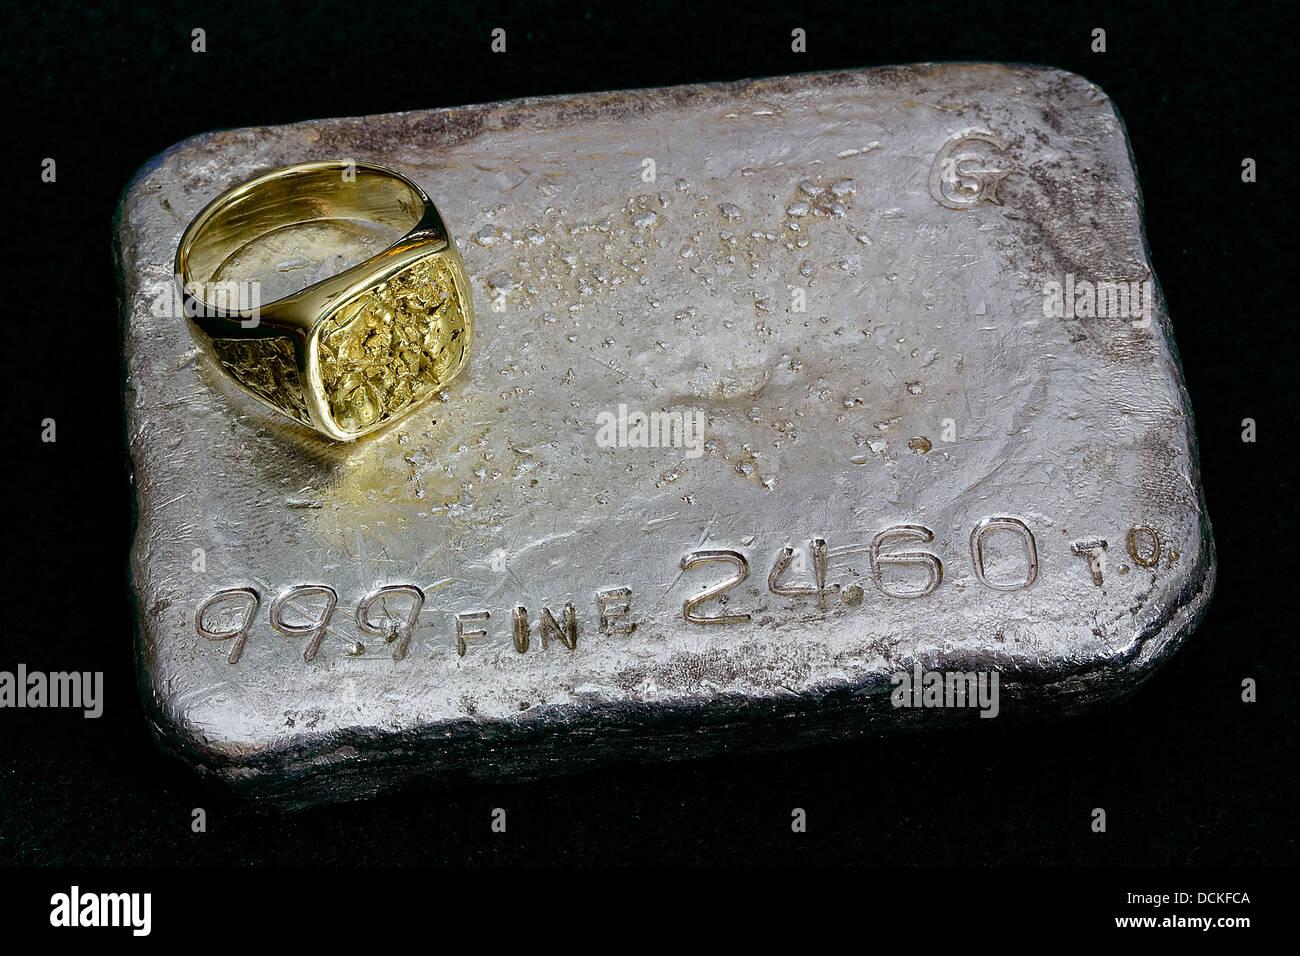 Großen Gold-Nugget-Ring und 24.60 Troy Unze Goldbarren Silberbarren (gegossene Barren) Stockbild